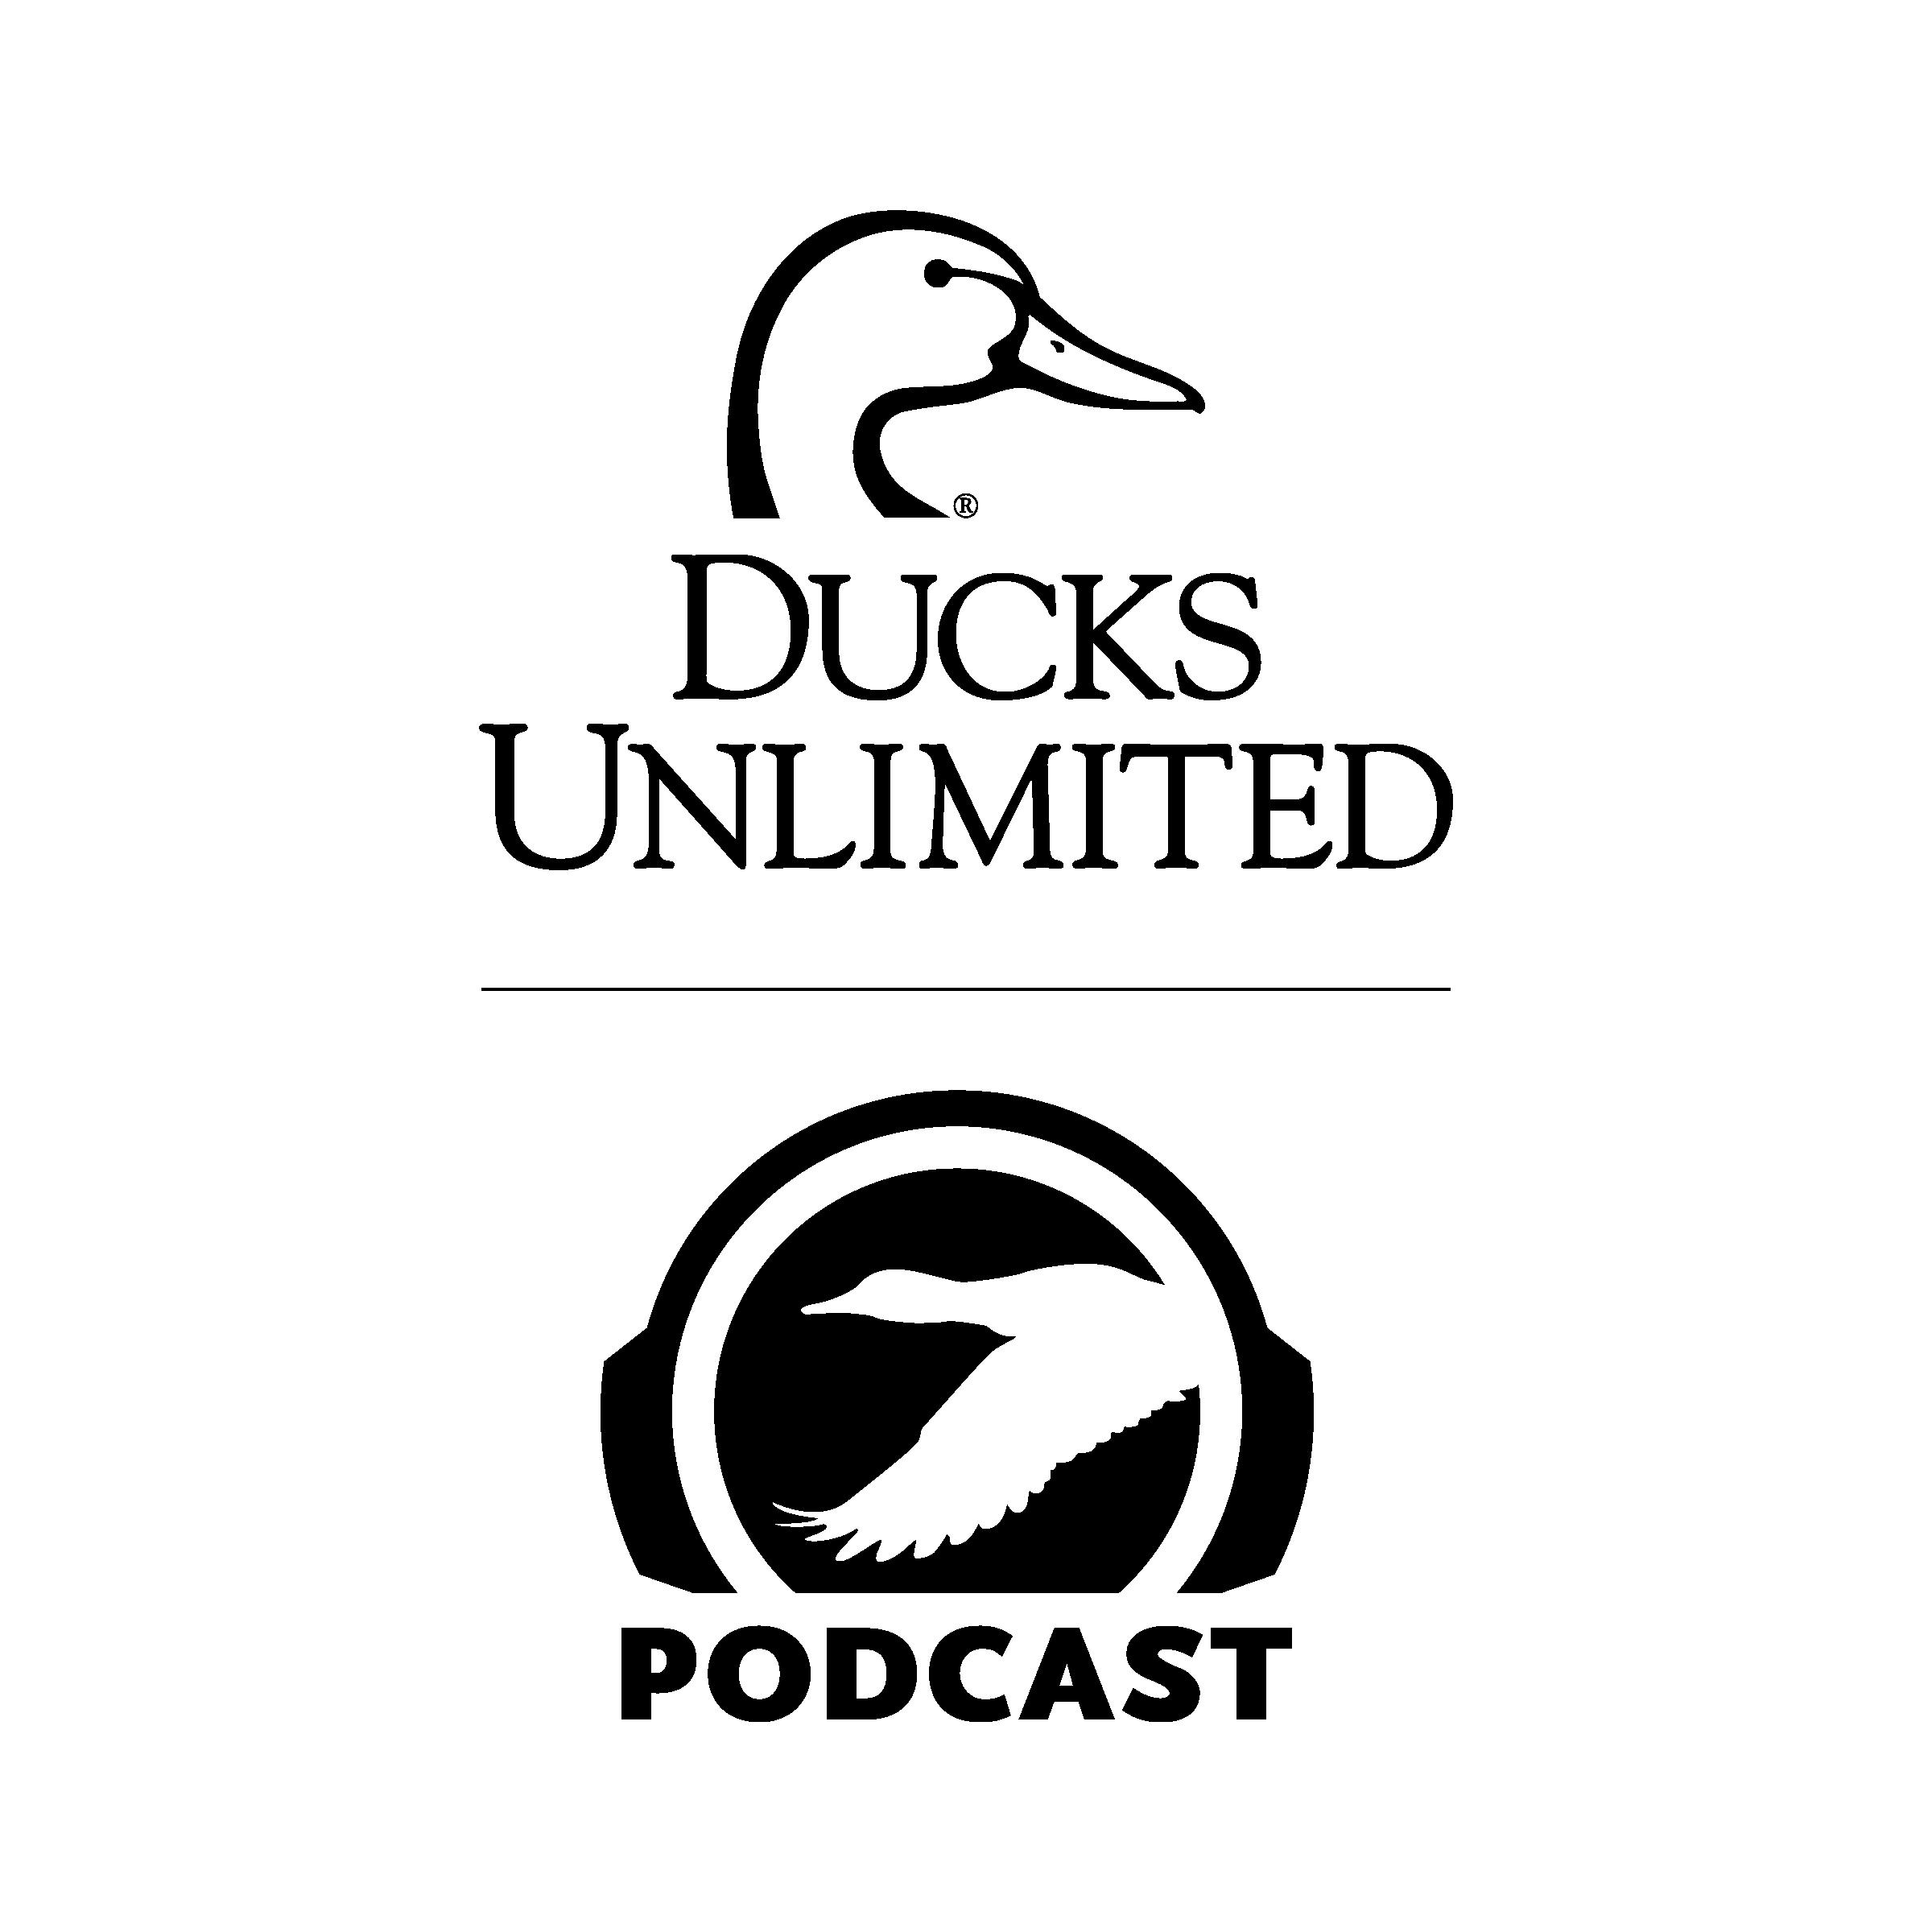 Ducks Unlimited Podcast show art